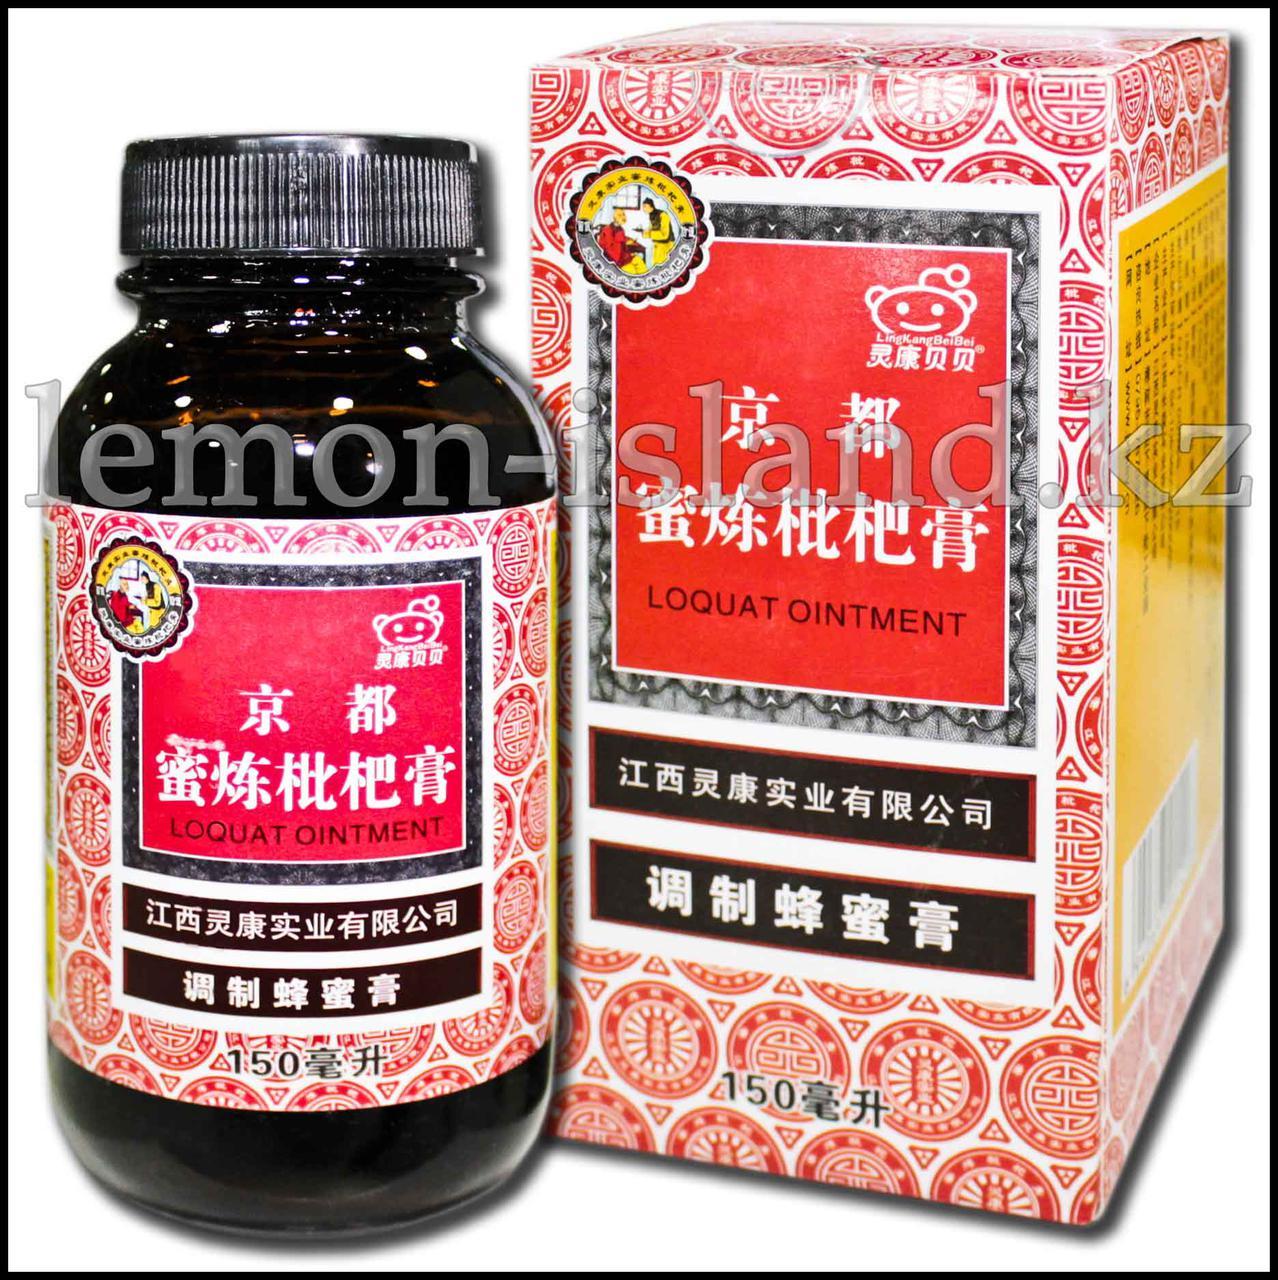 Сироп от кашля на основе экстракта листьев мушмулы, имбиря и мёда.